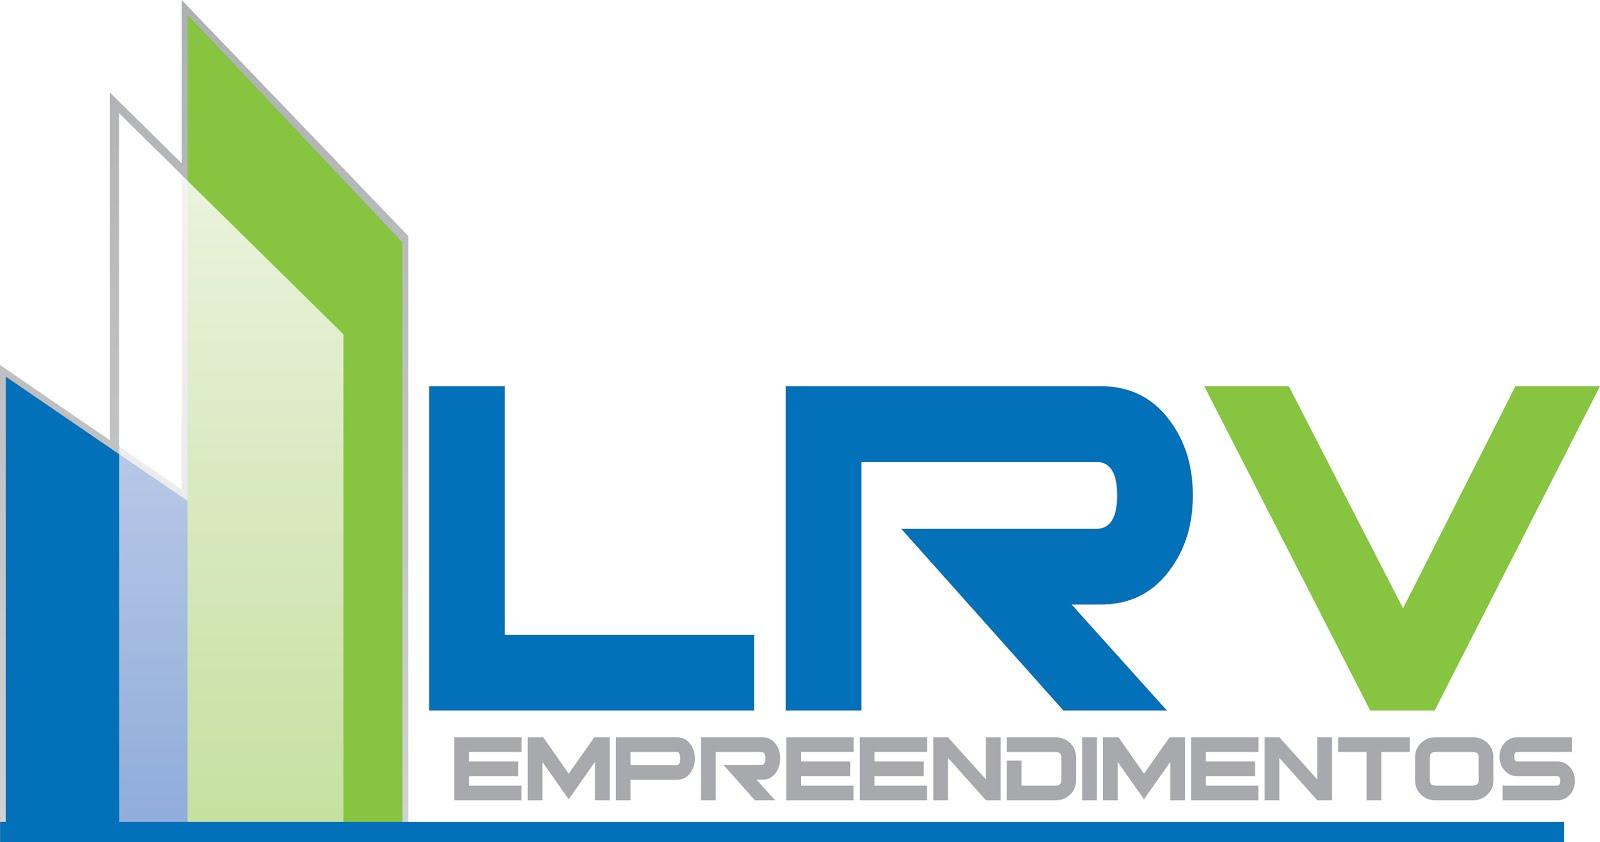 LRV EMPREEDIMENTOS